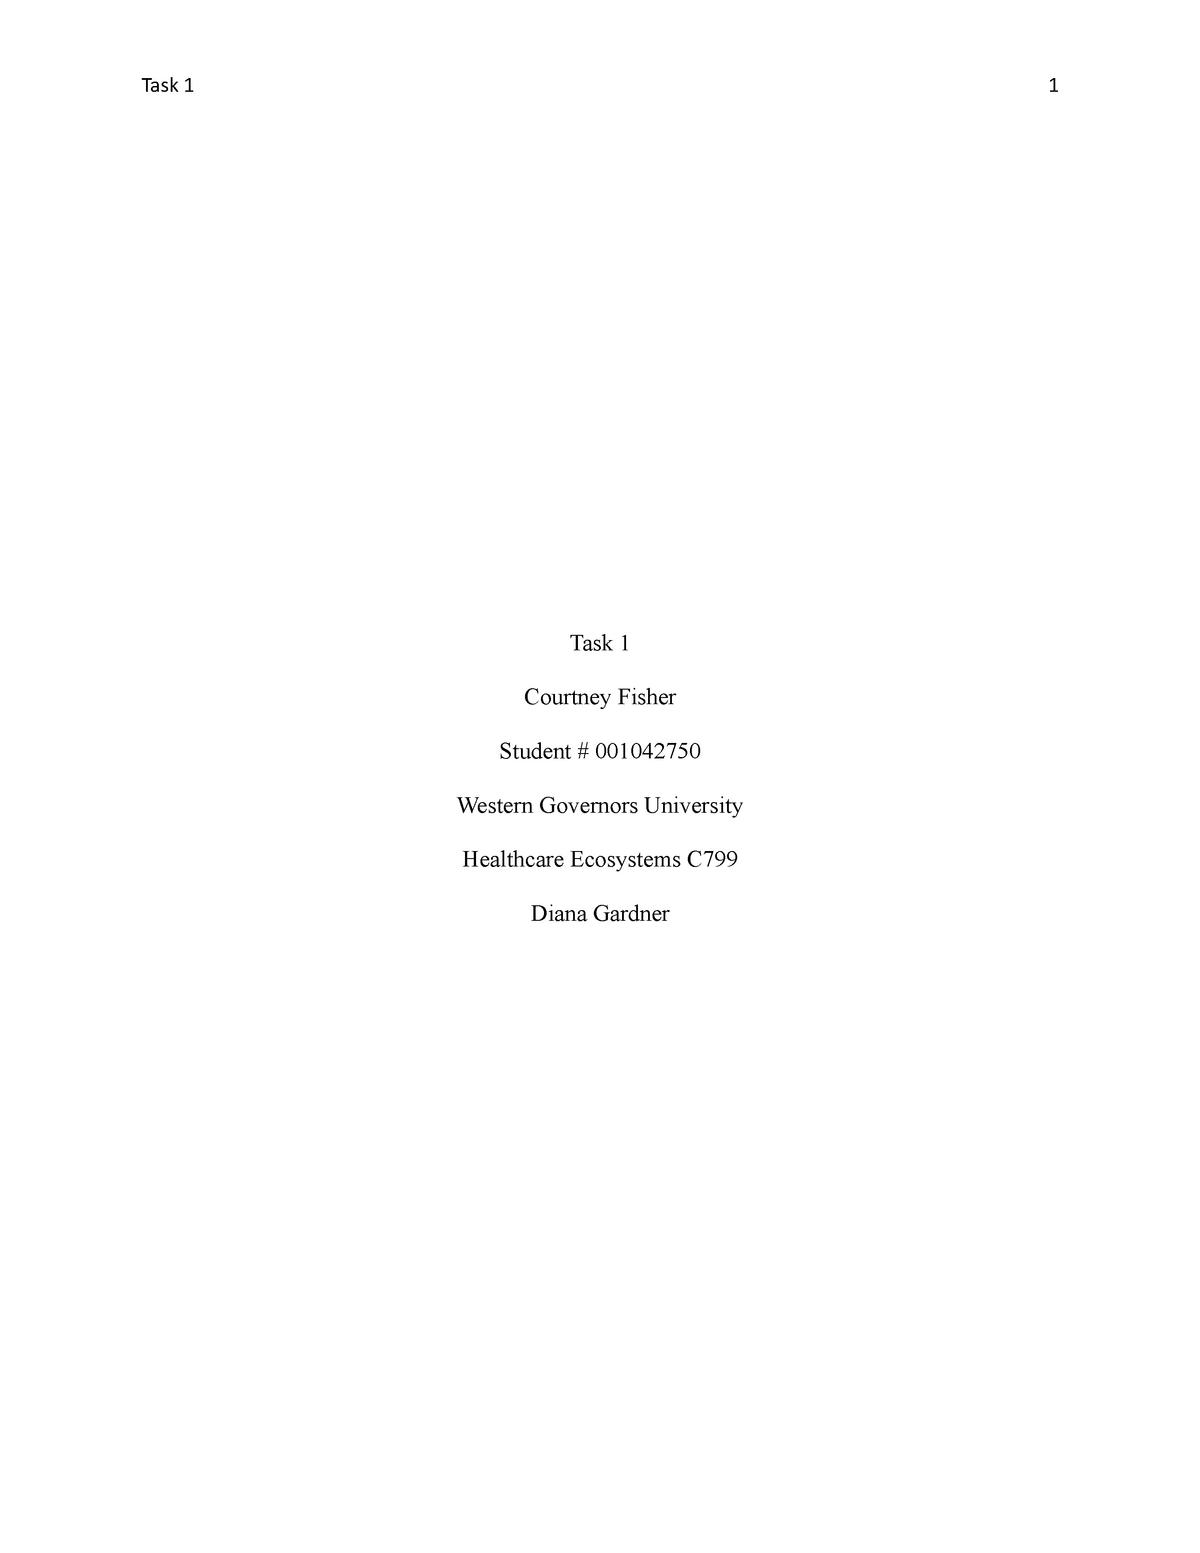 Healthcare Ecosystems – C799 Task 1 - C399 - StuDocu